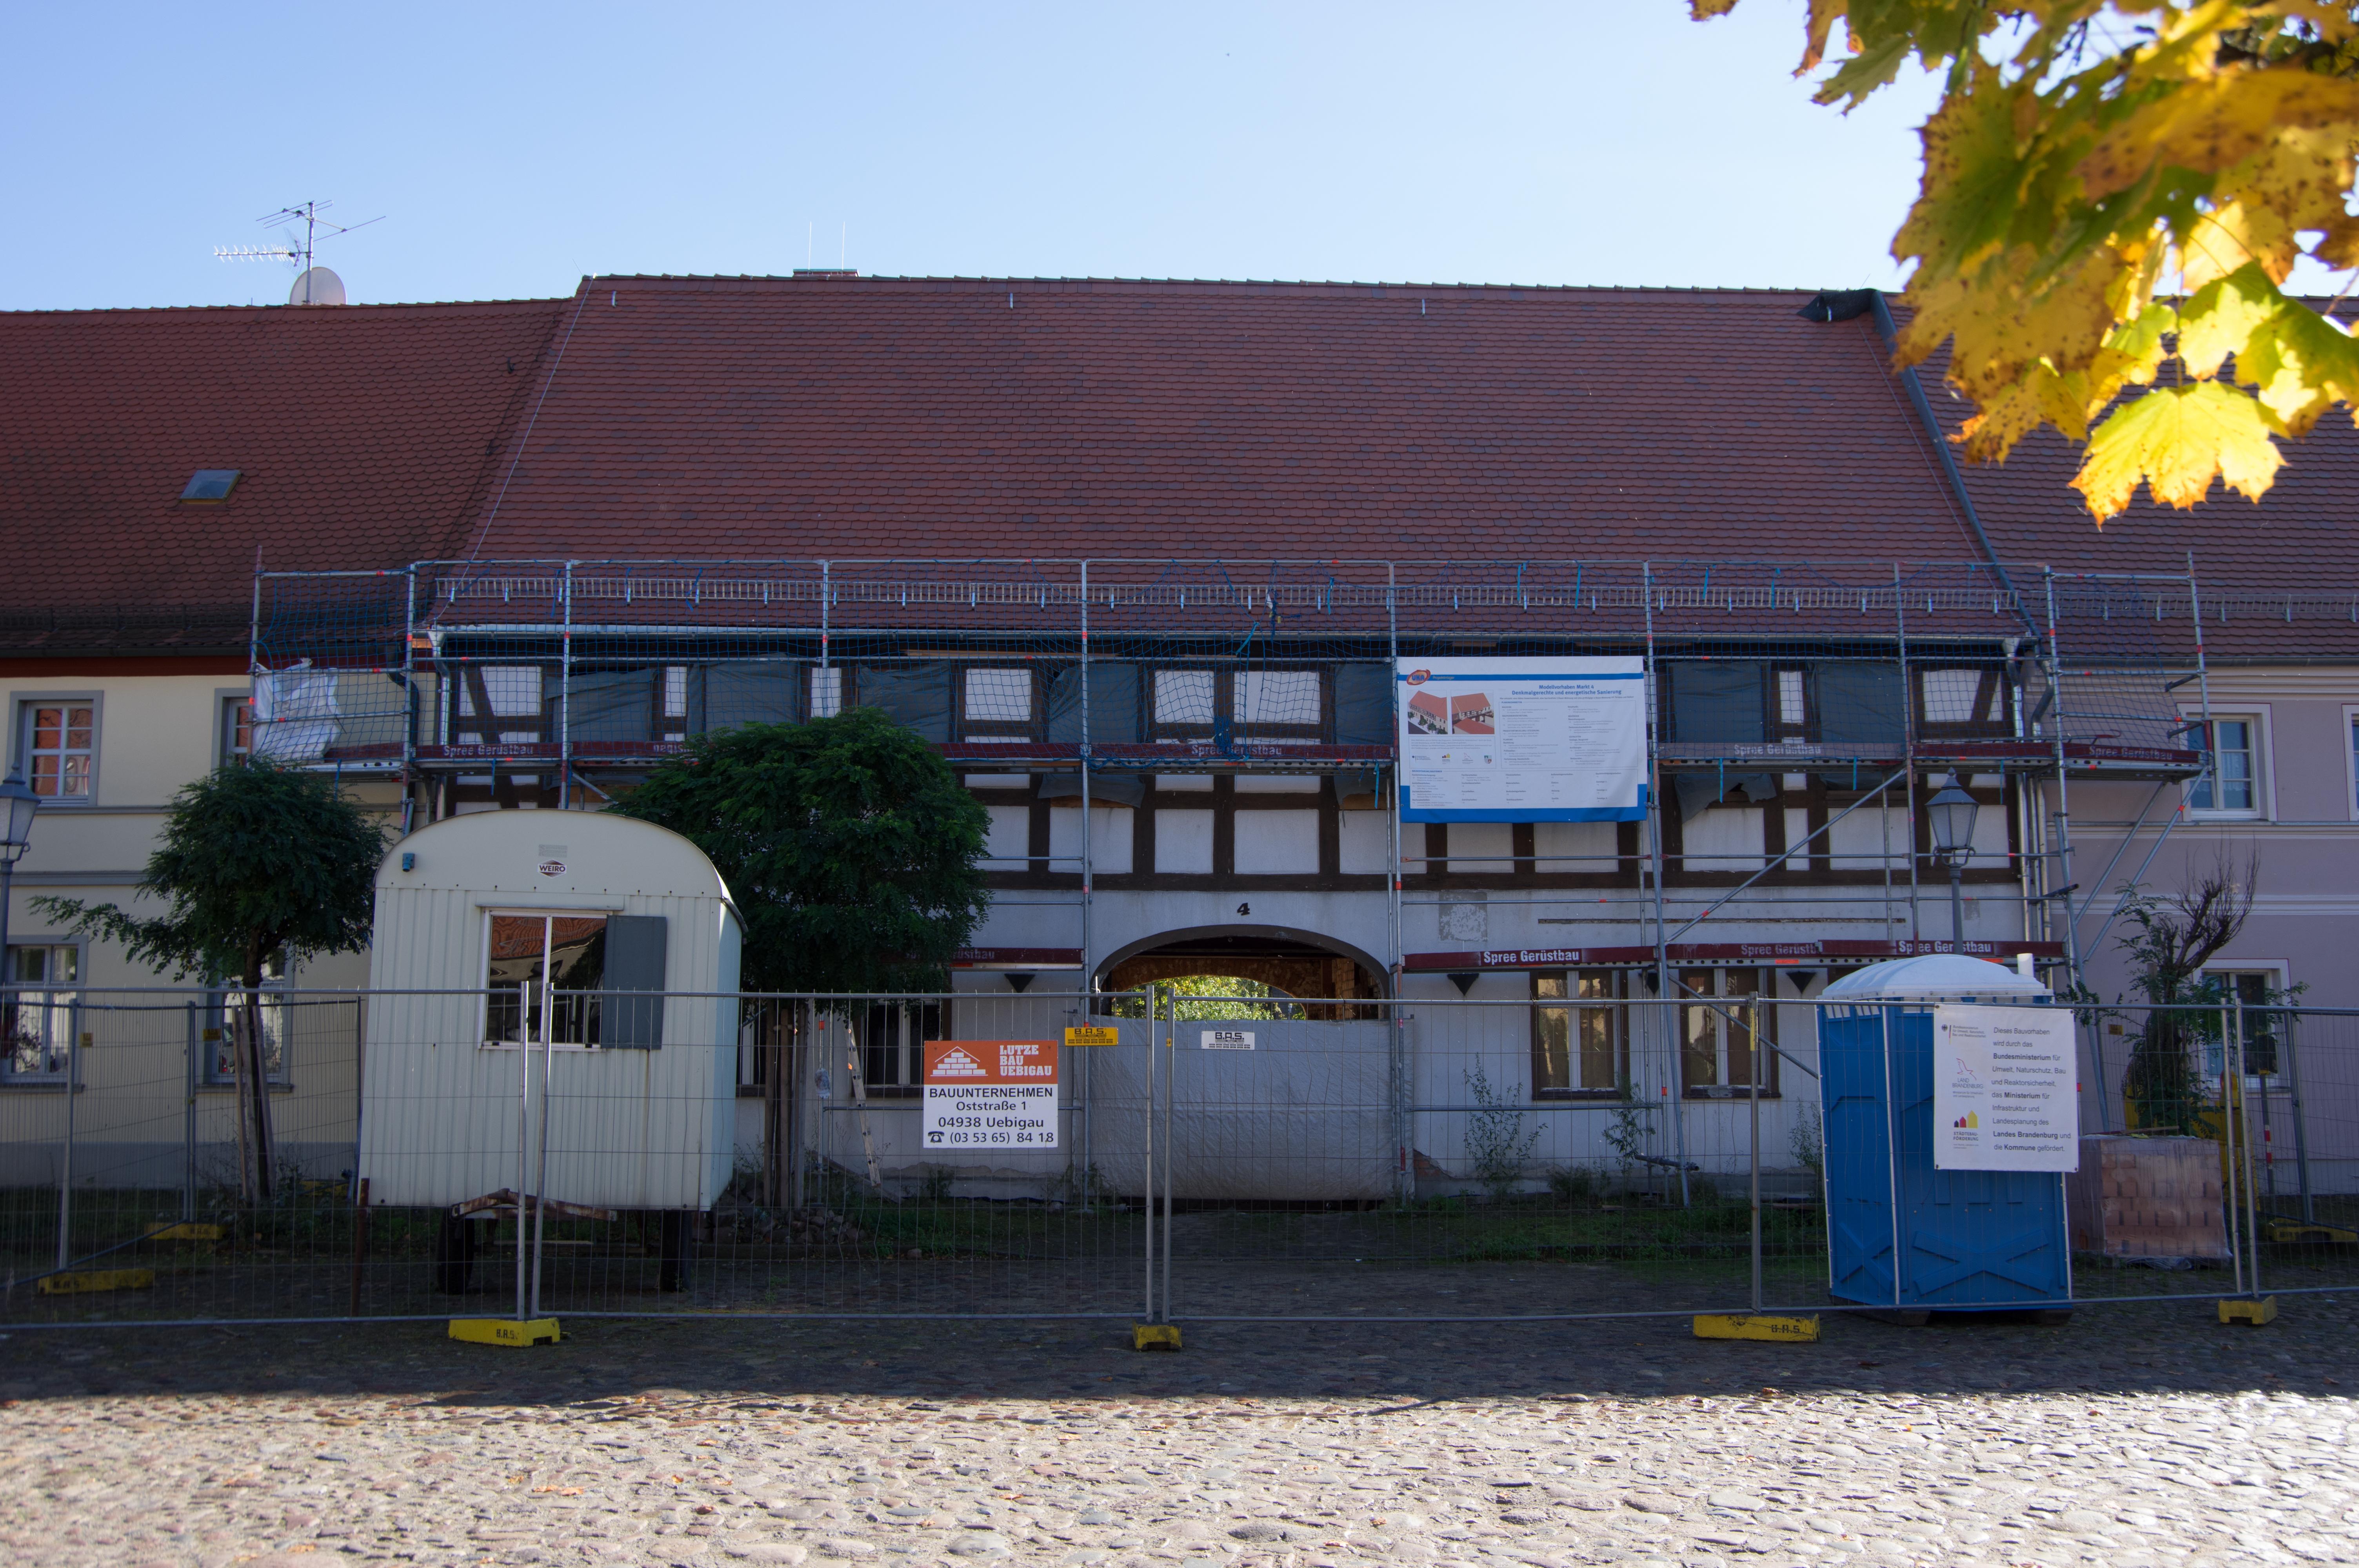 Hure Uebigau-Wahrenbrück